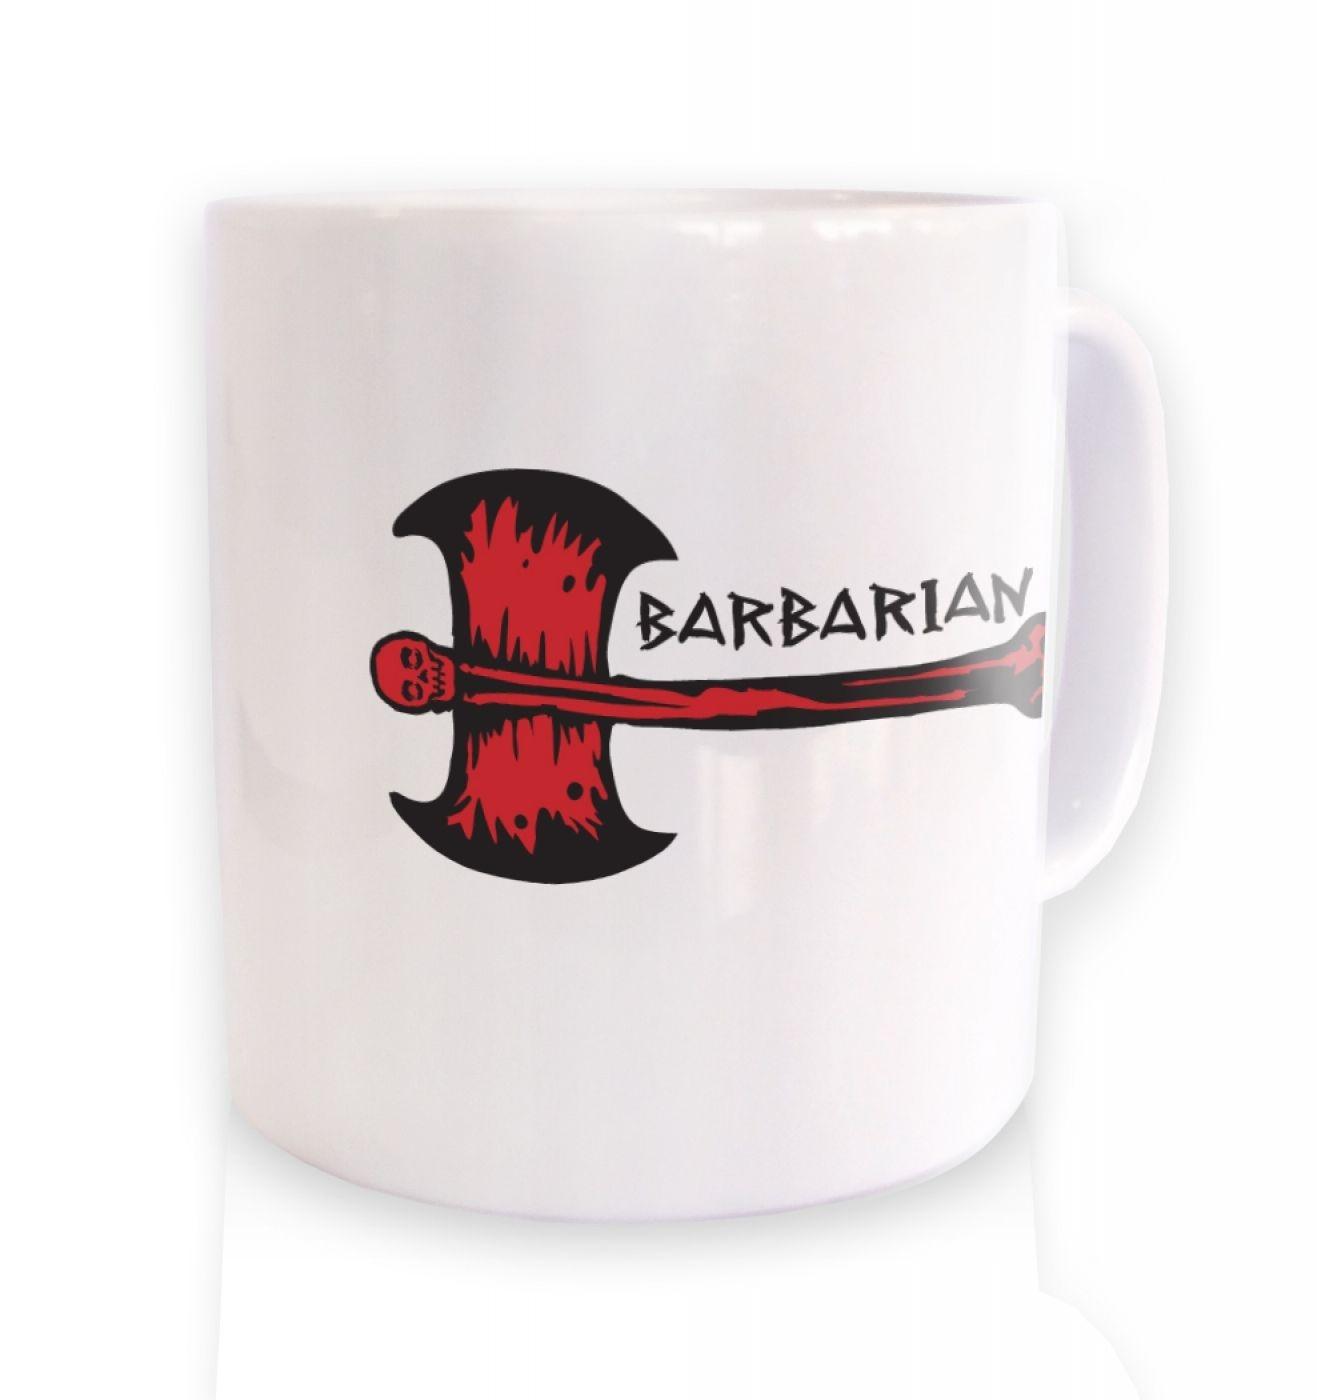 Red Barbarian Axe ceramic coffee mug